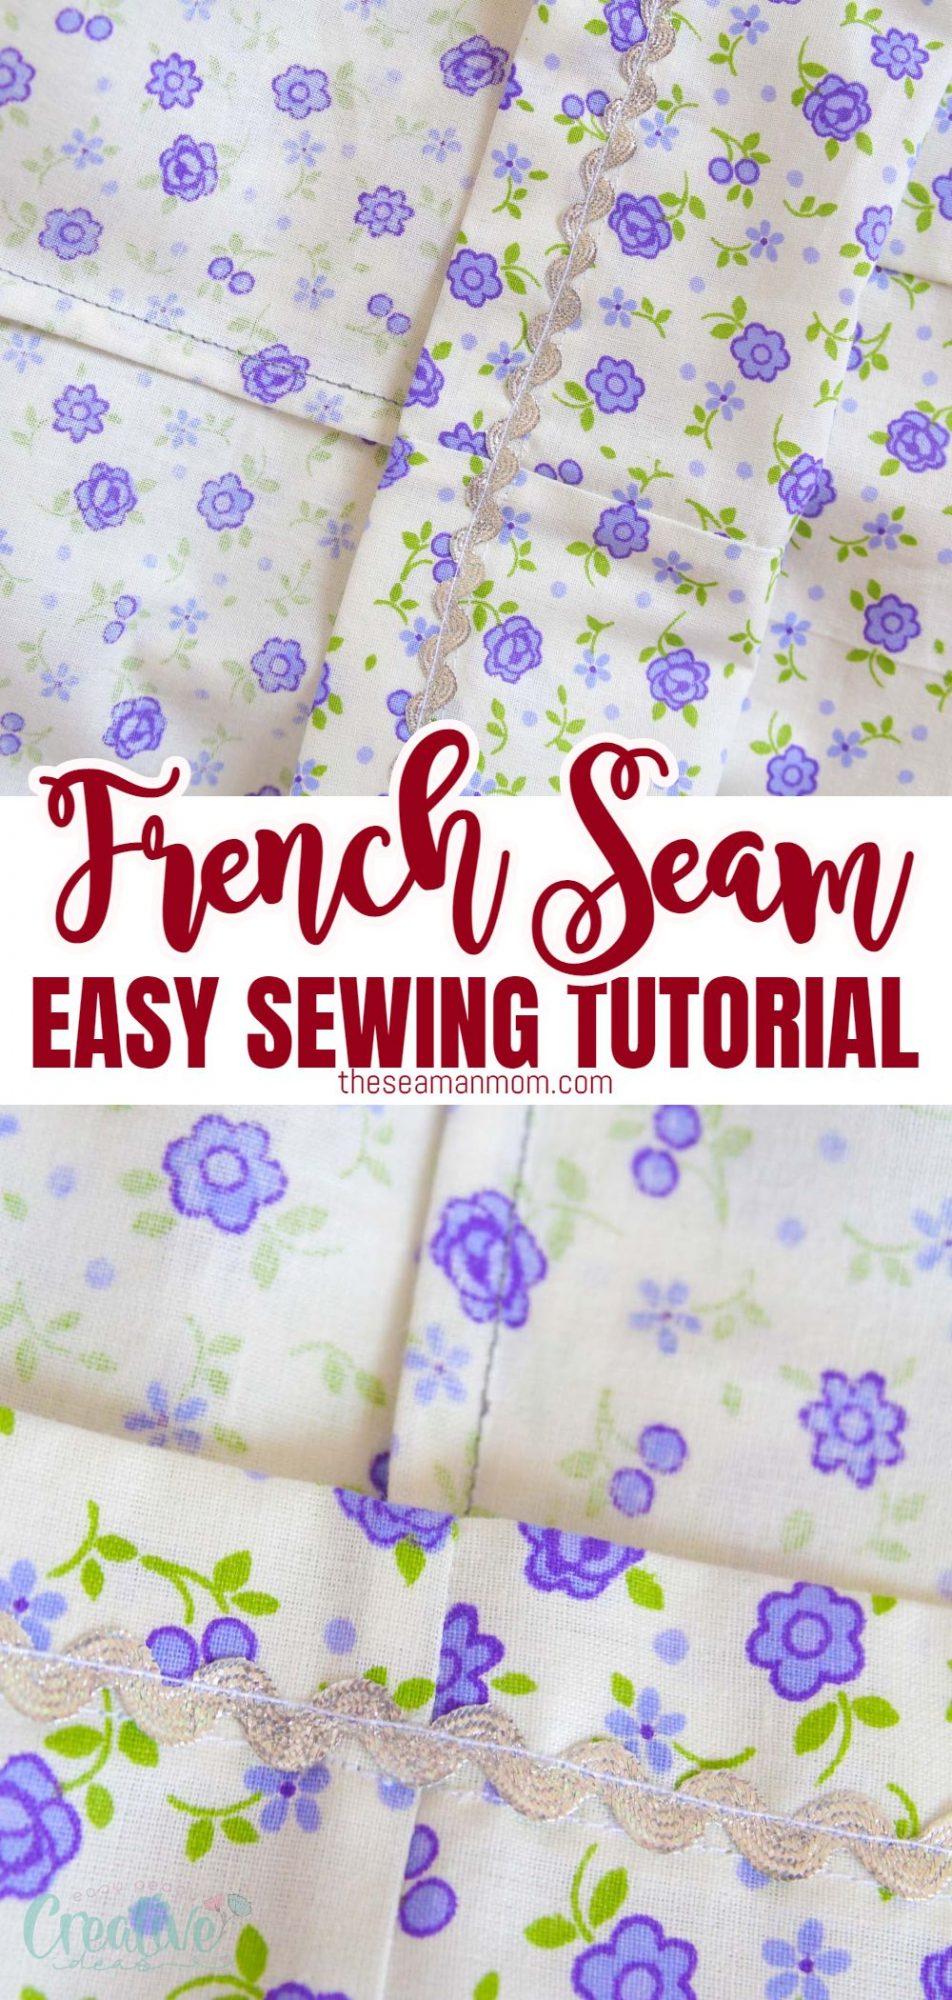 Photo collage of French seam technique